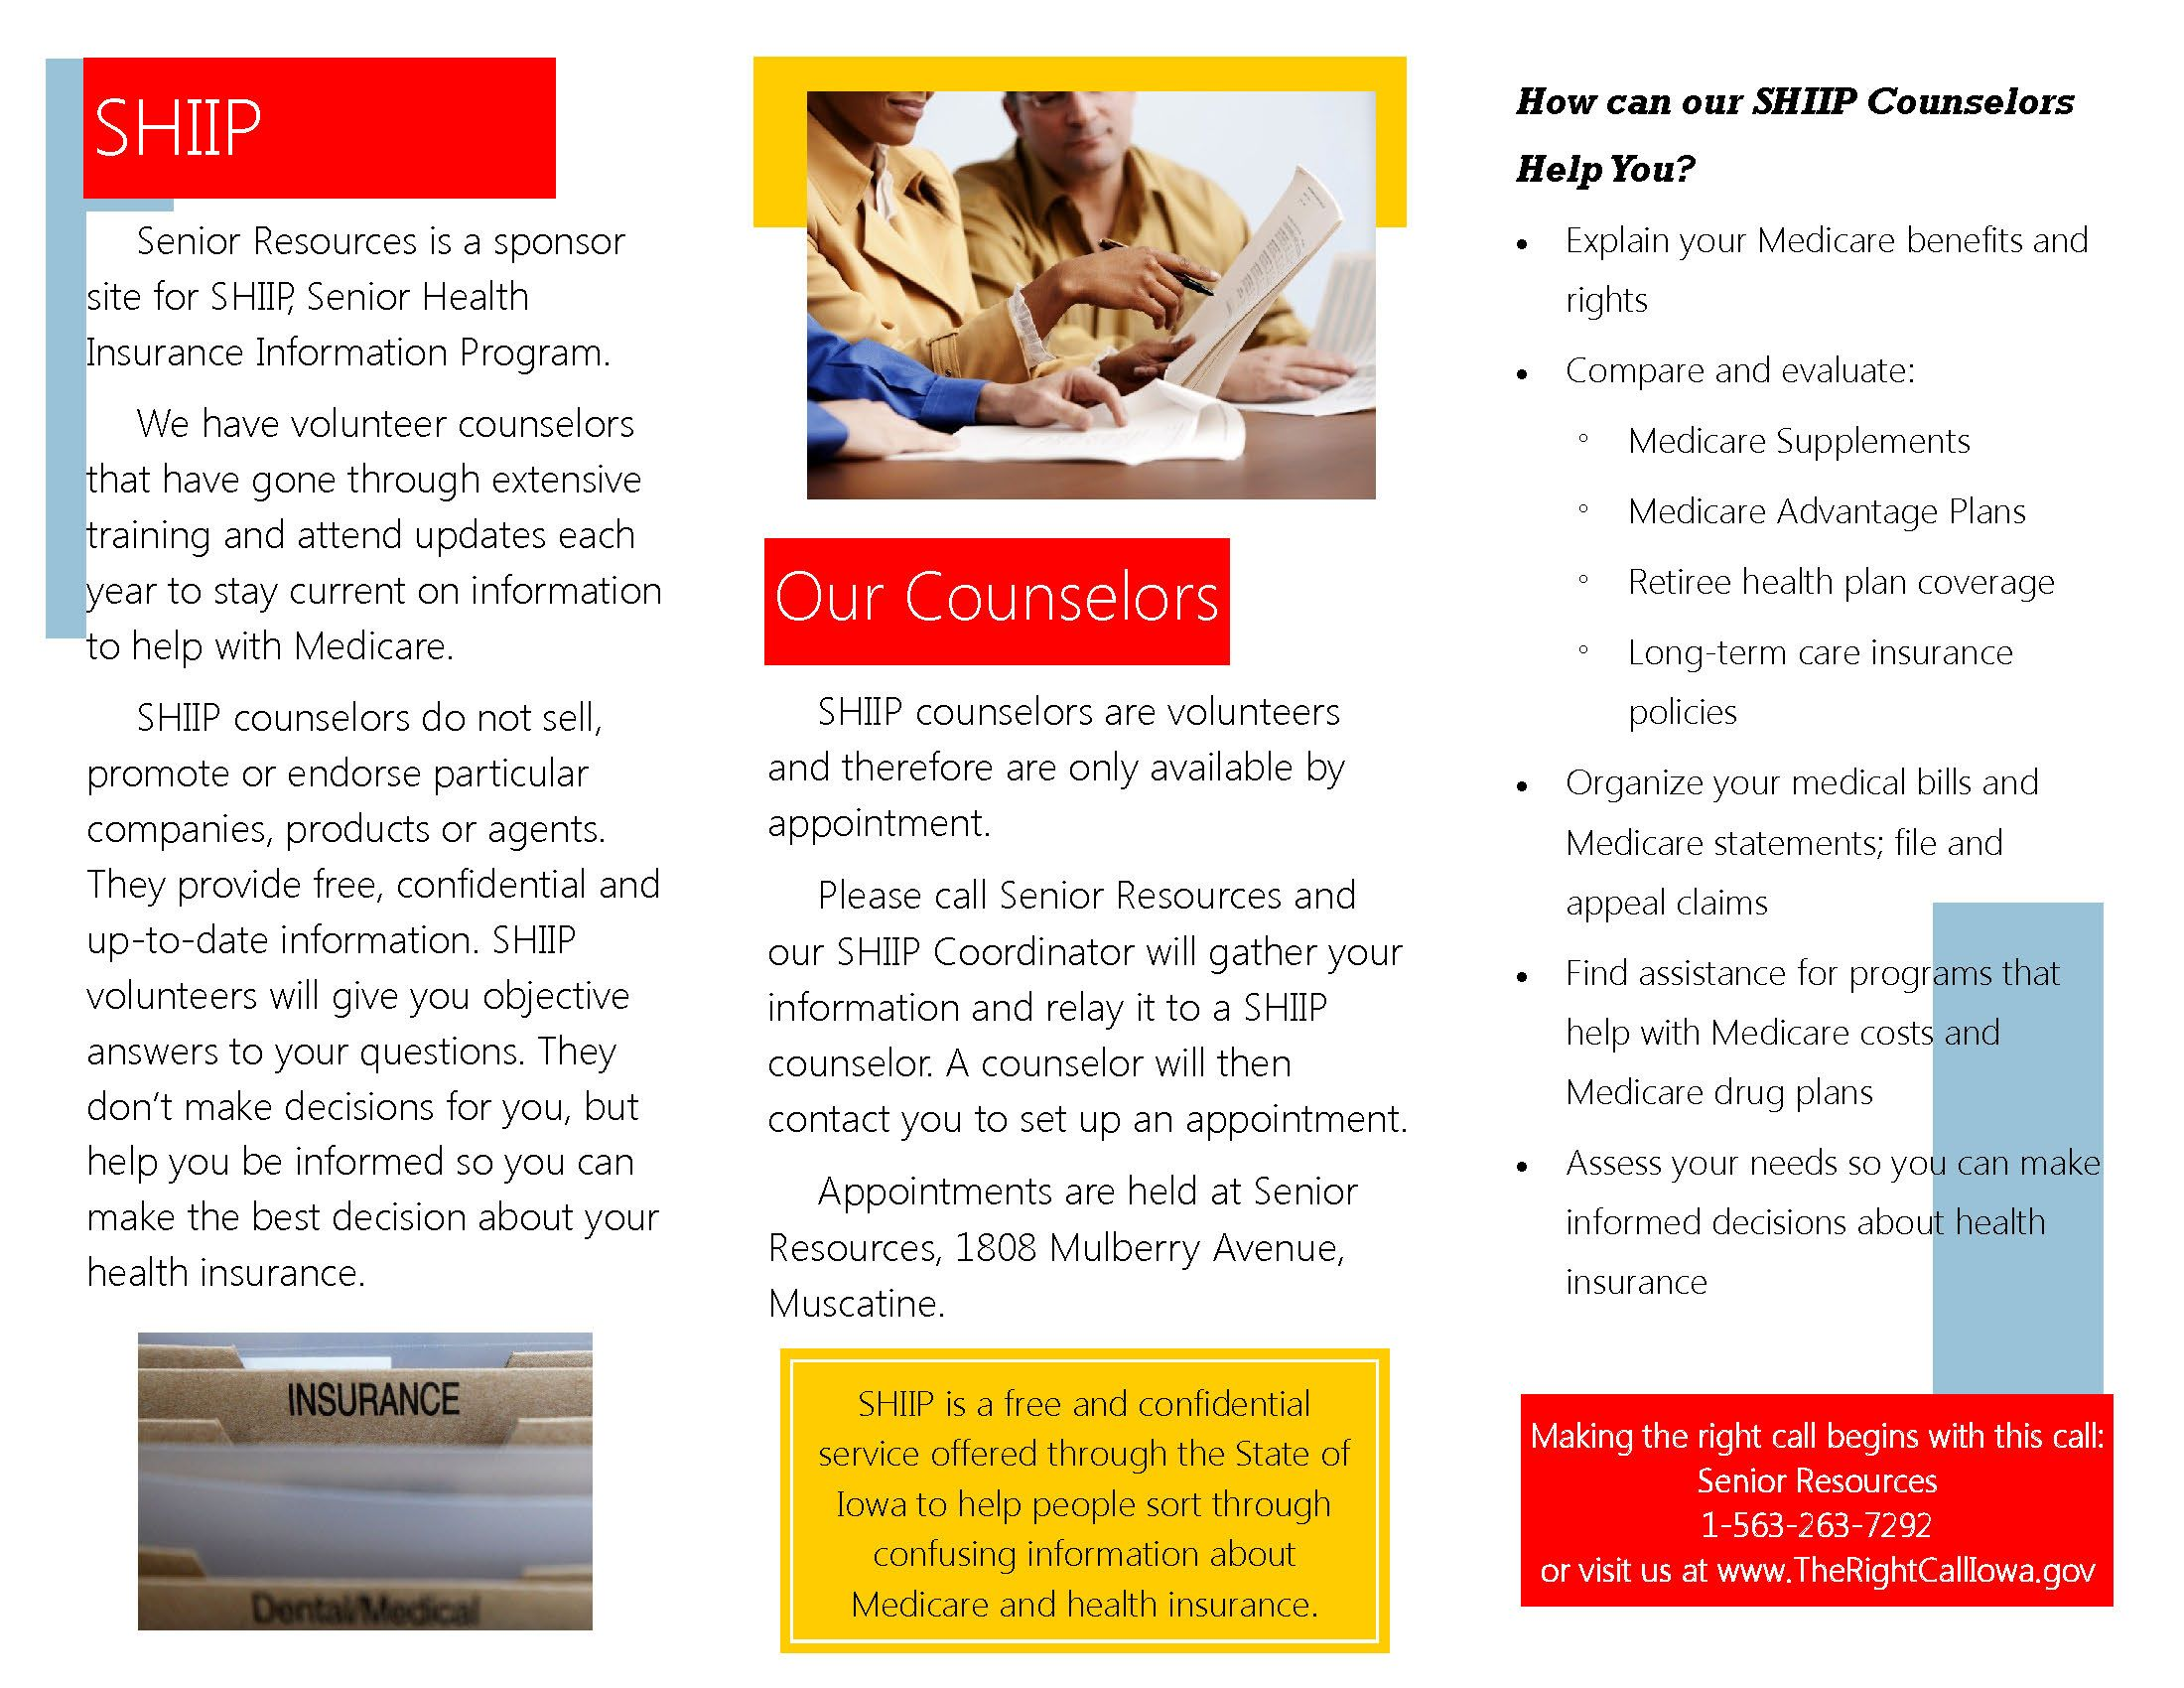 Senior Health Insurance Information Program (SHIIP ...